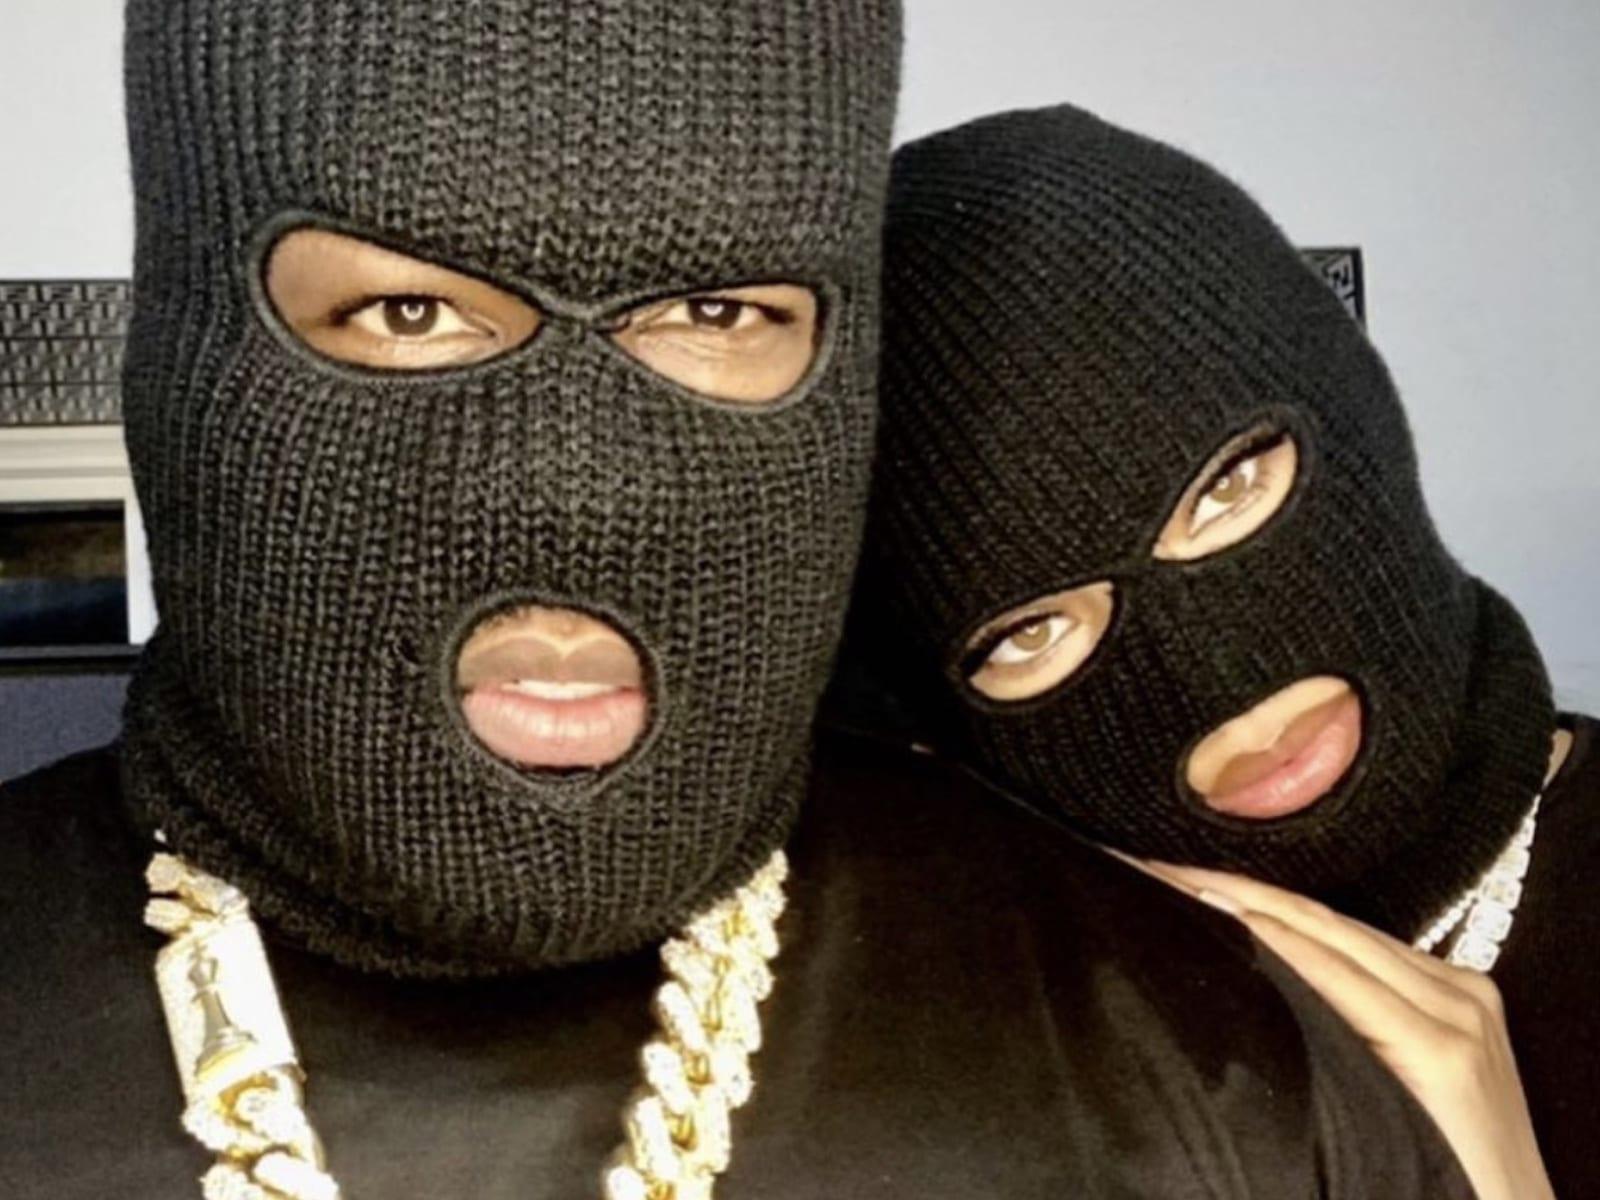 50 Cent Cuban Link Ski Masks 2